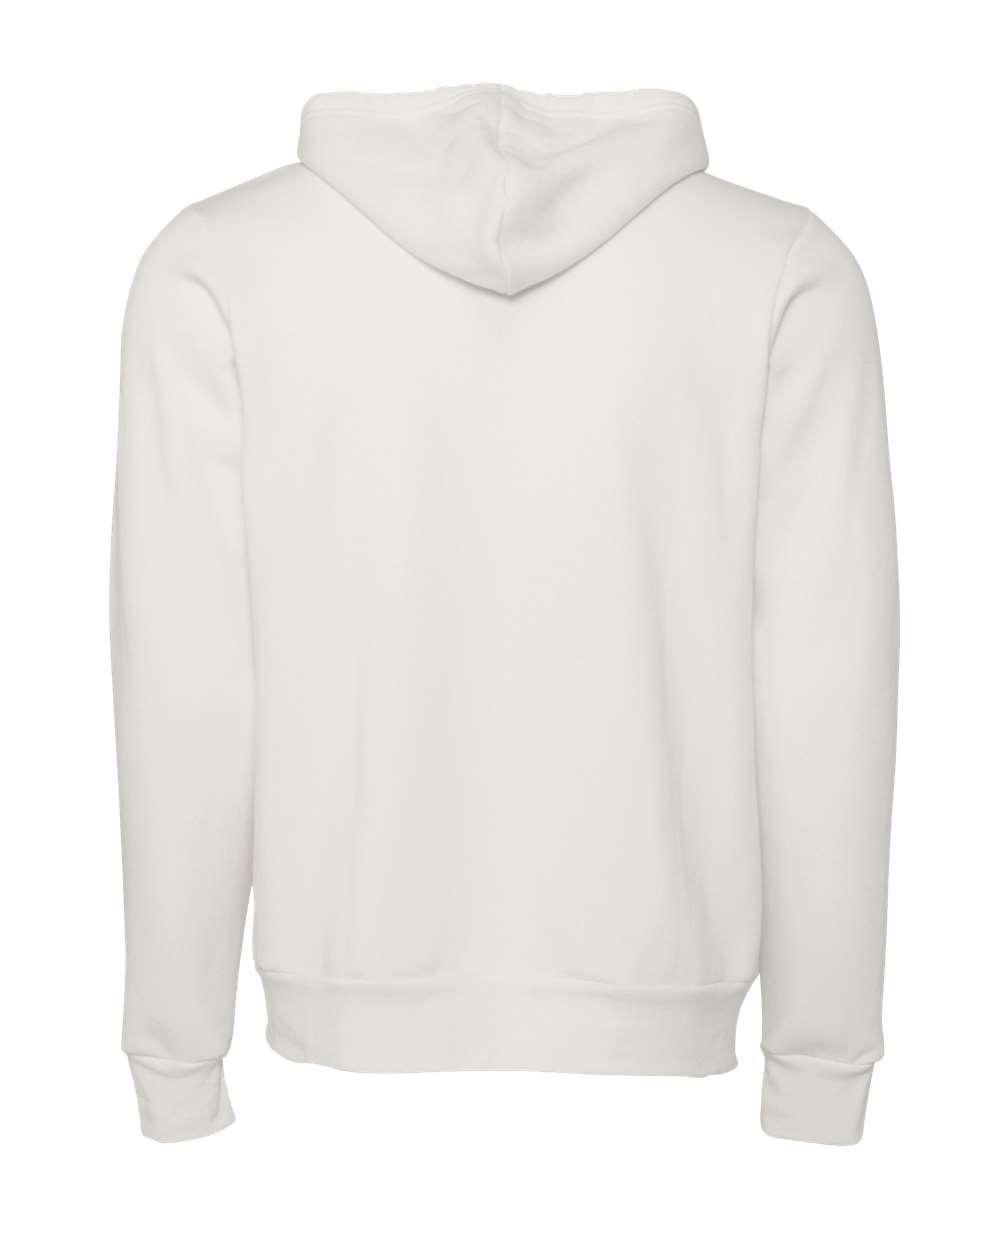 Bella-Canvas-Unisex-Full-Zip-Up-Hooded-Sweatshirt-Blank-Hoodie-3739-up-to-3XL thumbnail 88